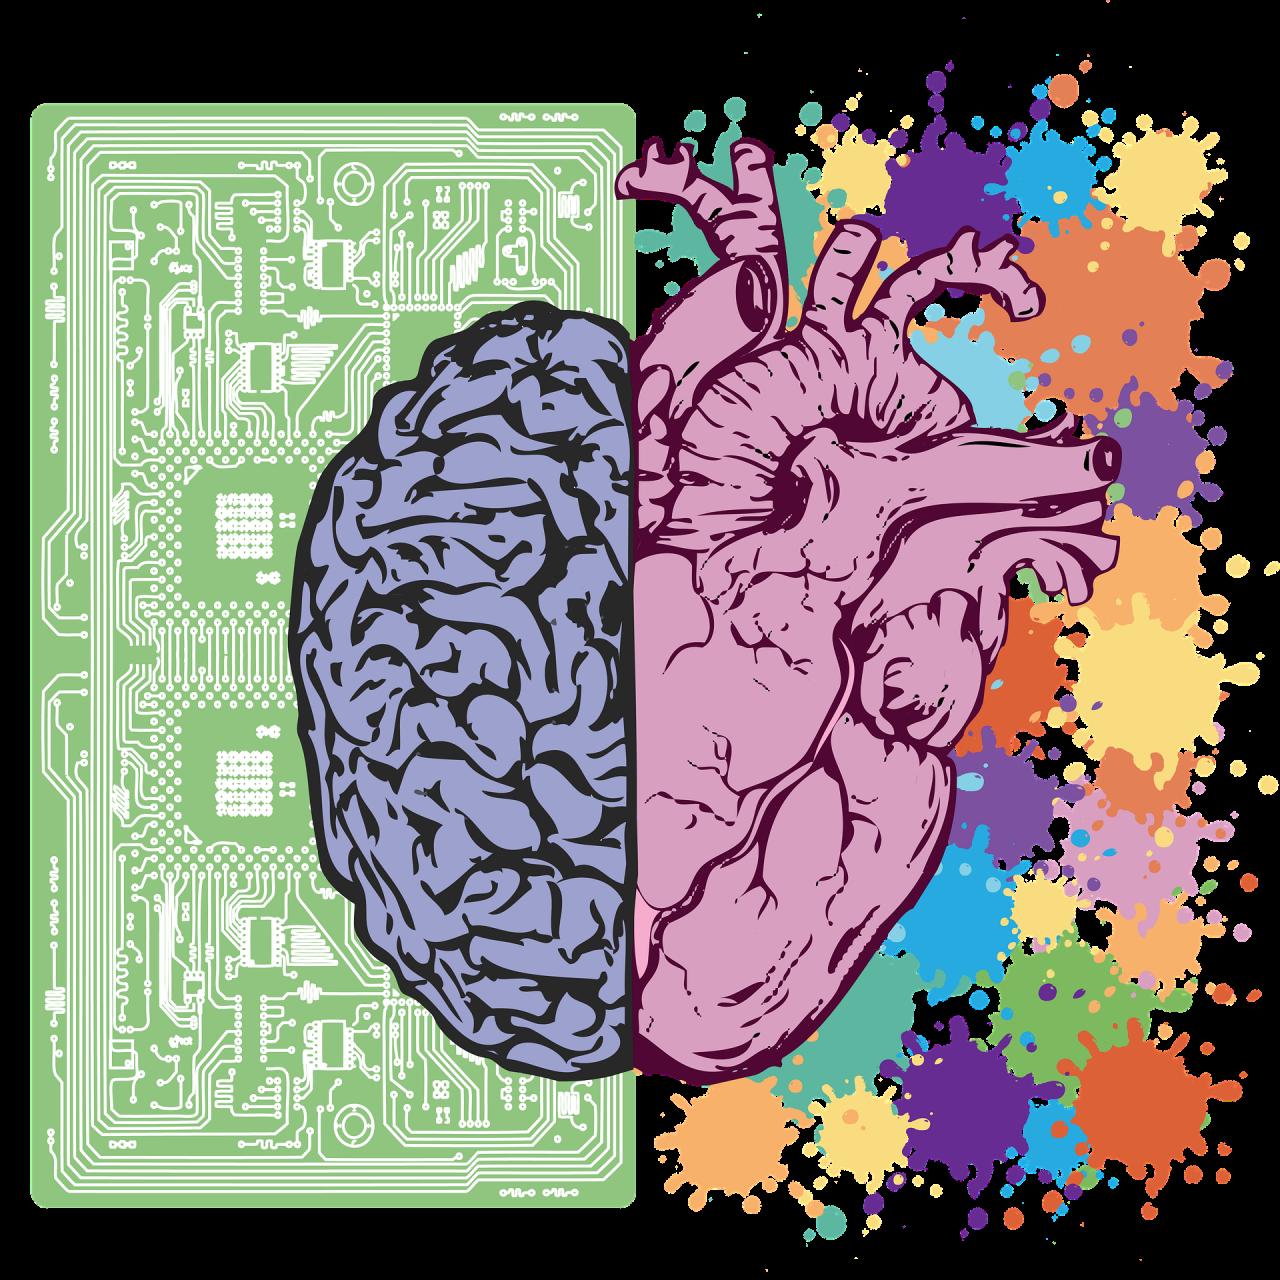 brain-3017071_1920-1280x1280.png